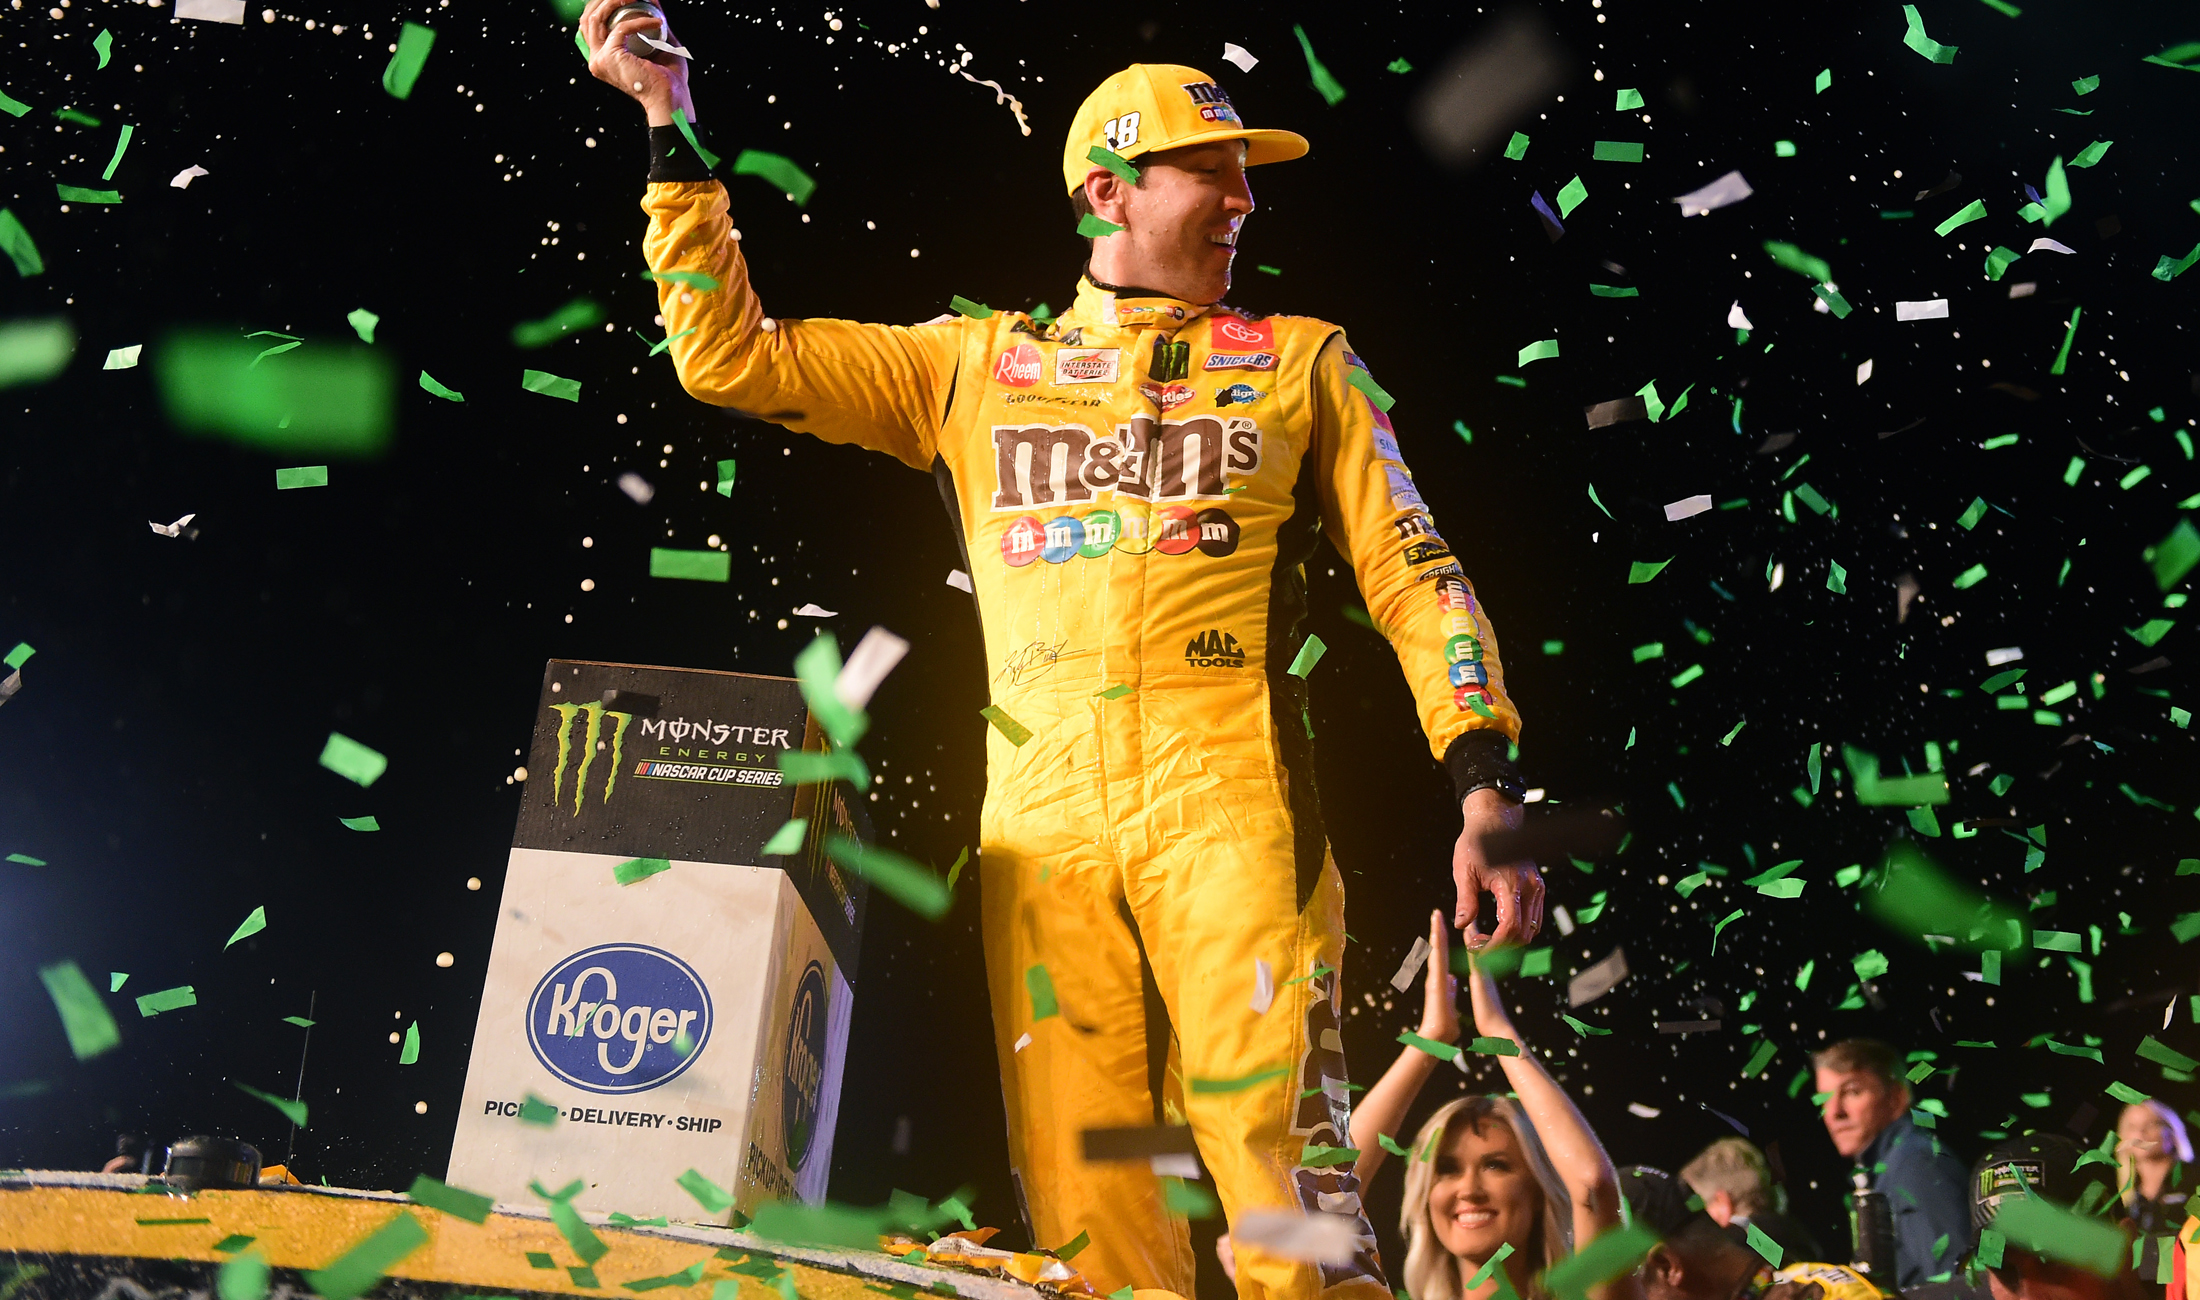 NASCAR champion Kyle Busch